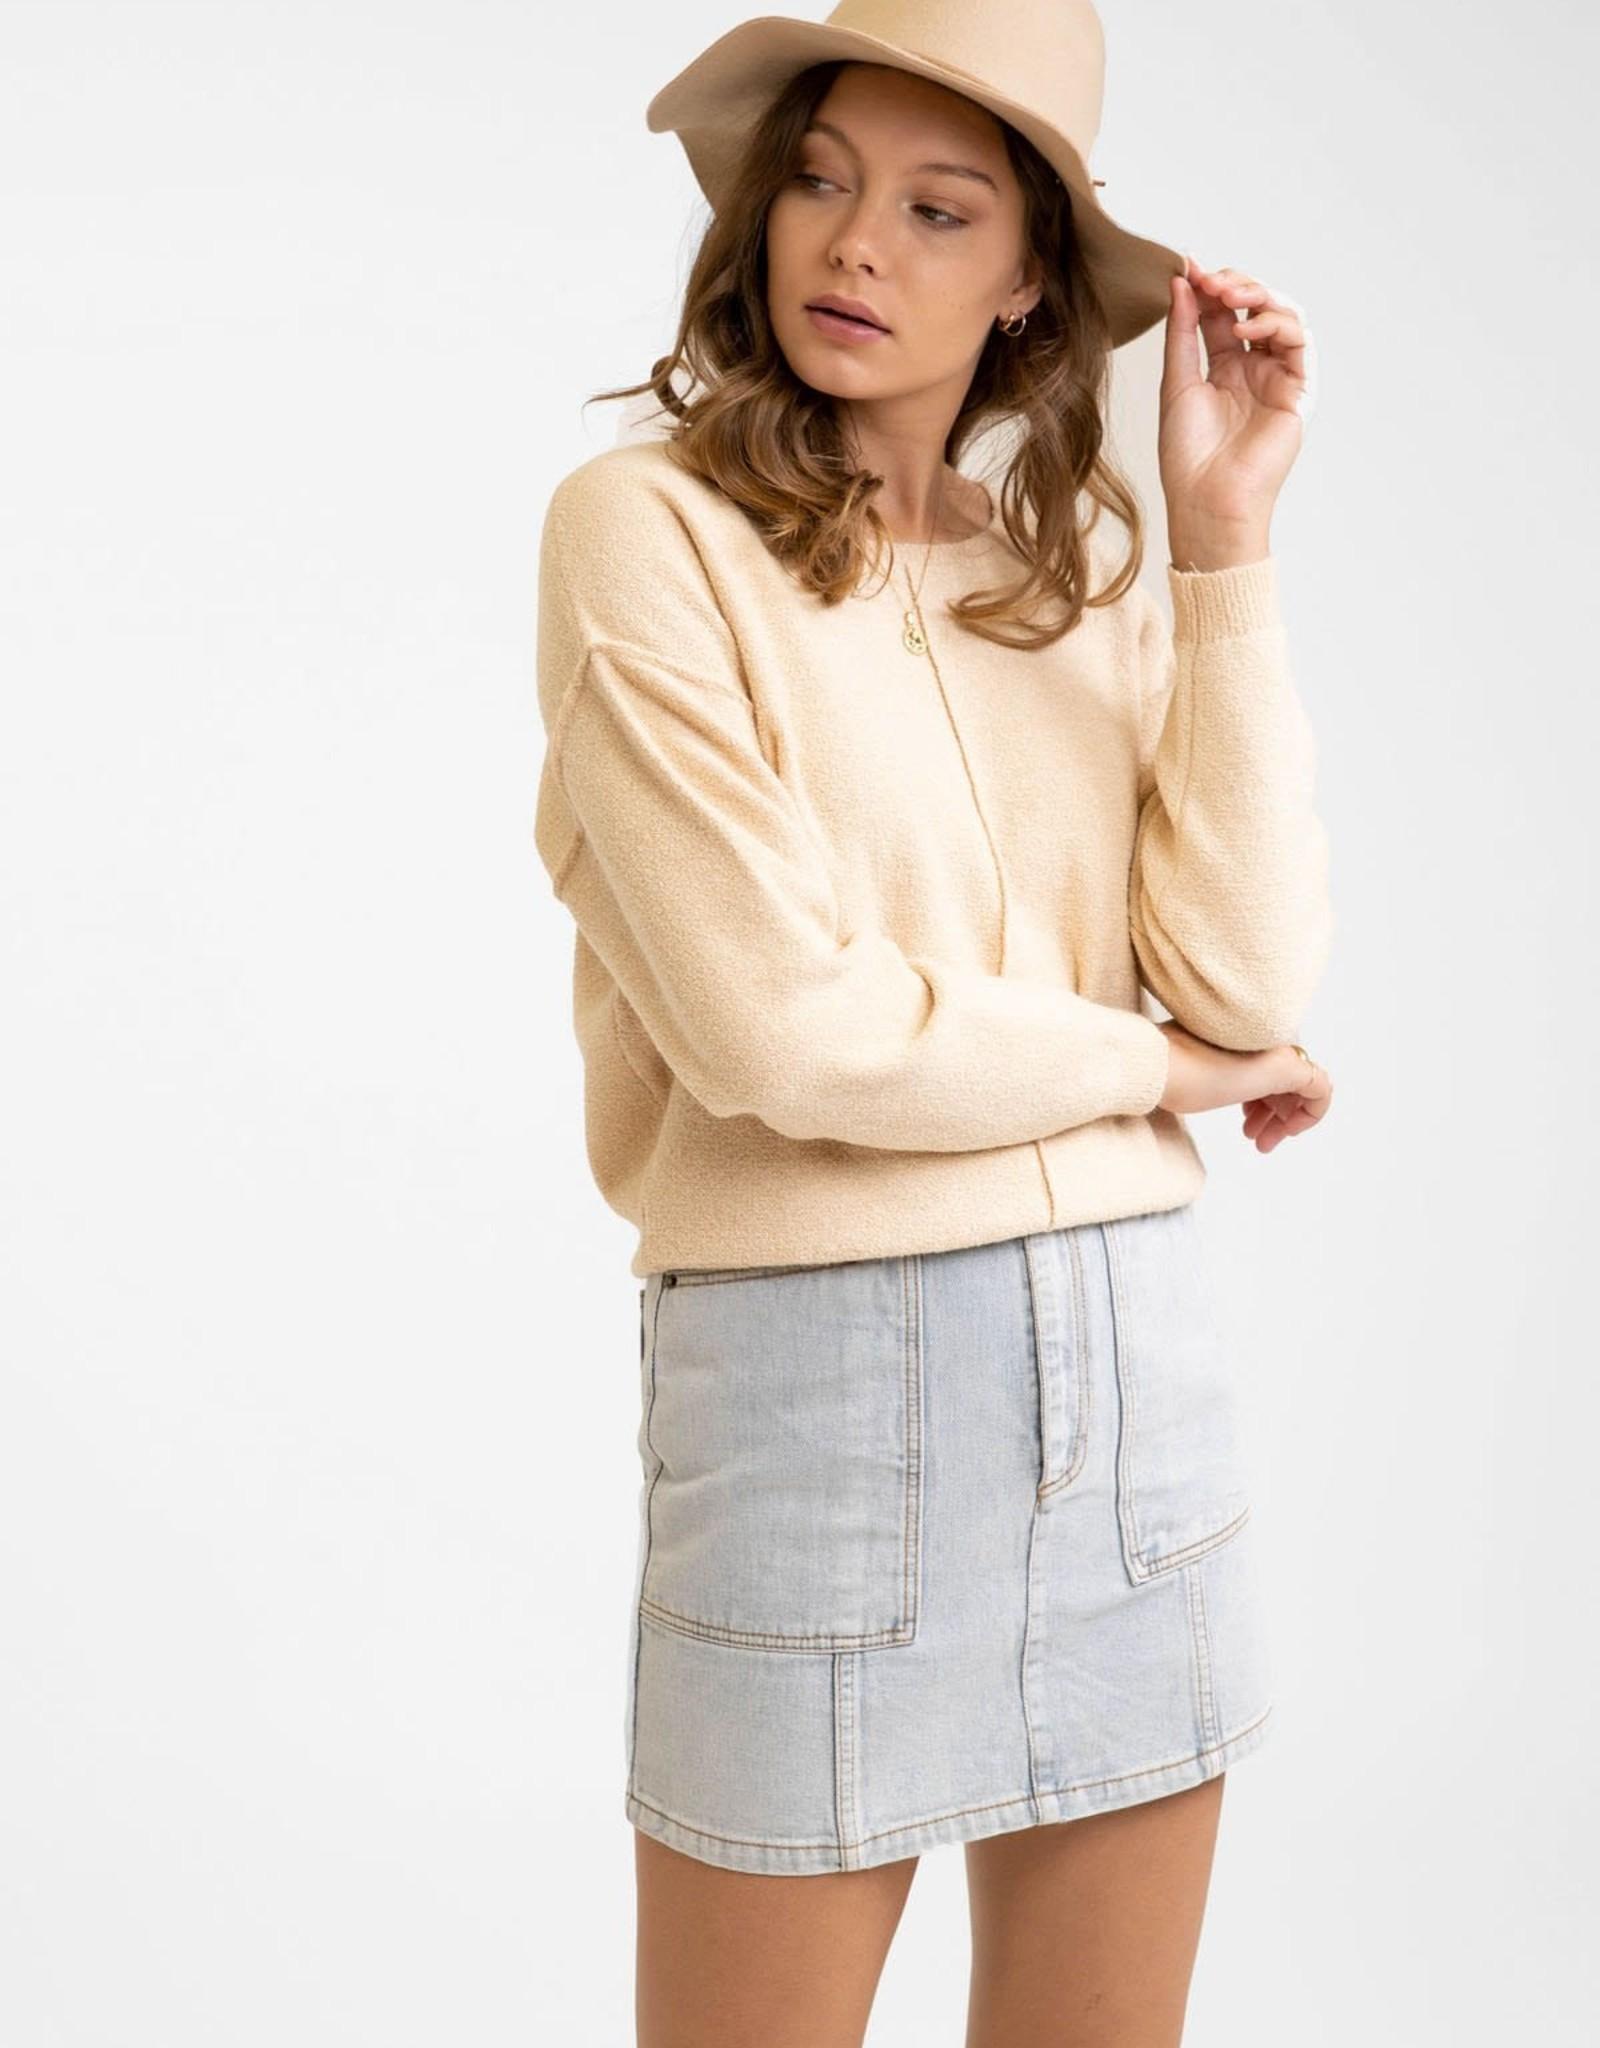 RHYTHM Silverlake Knit - Size 12